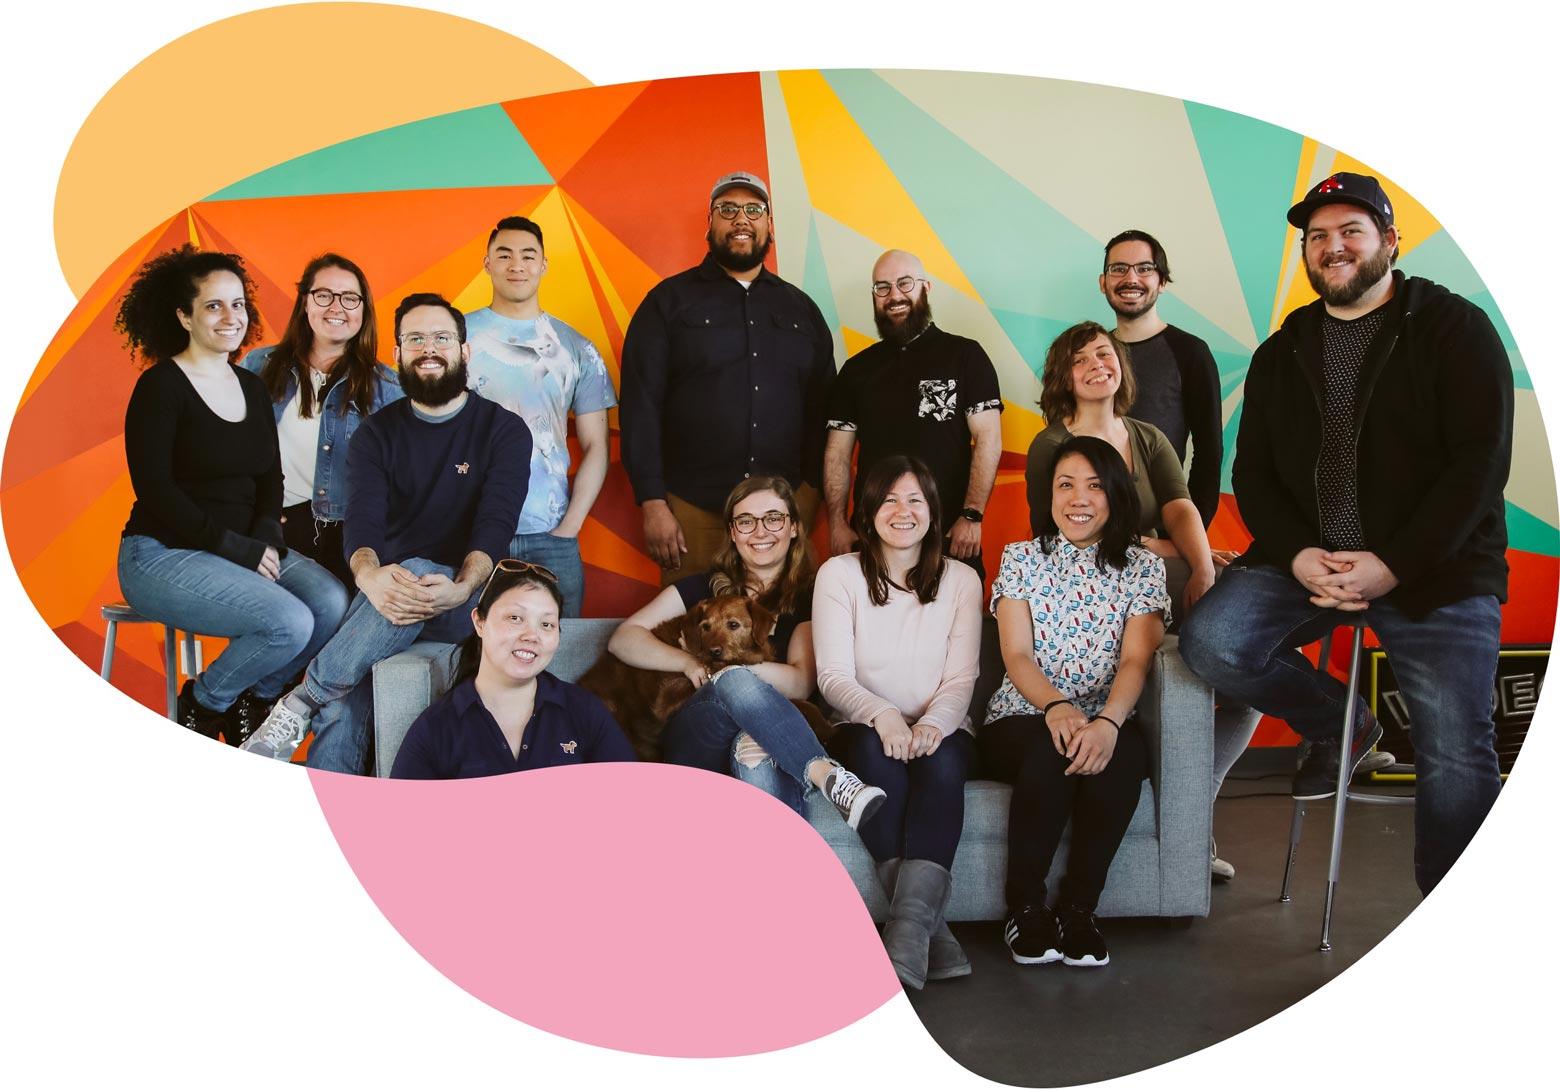 Wistia's Support Team Photo